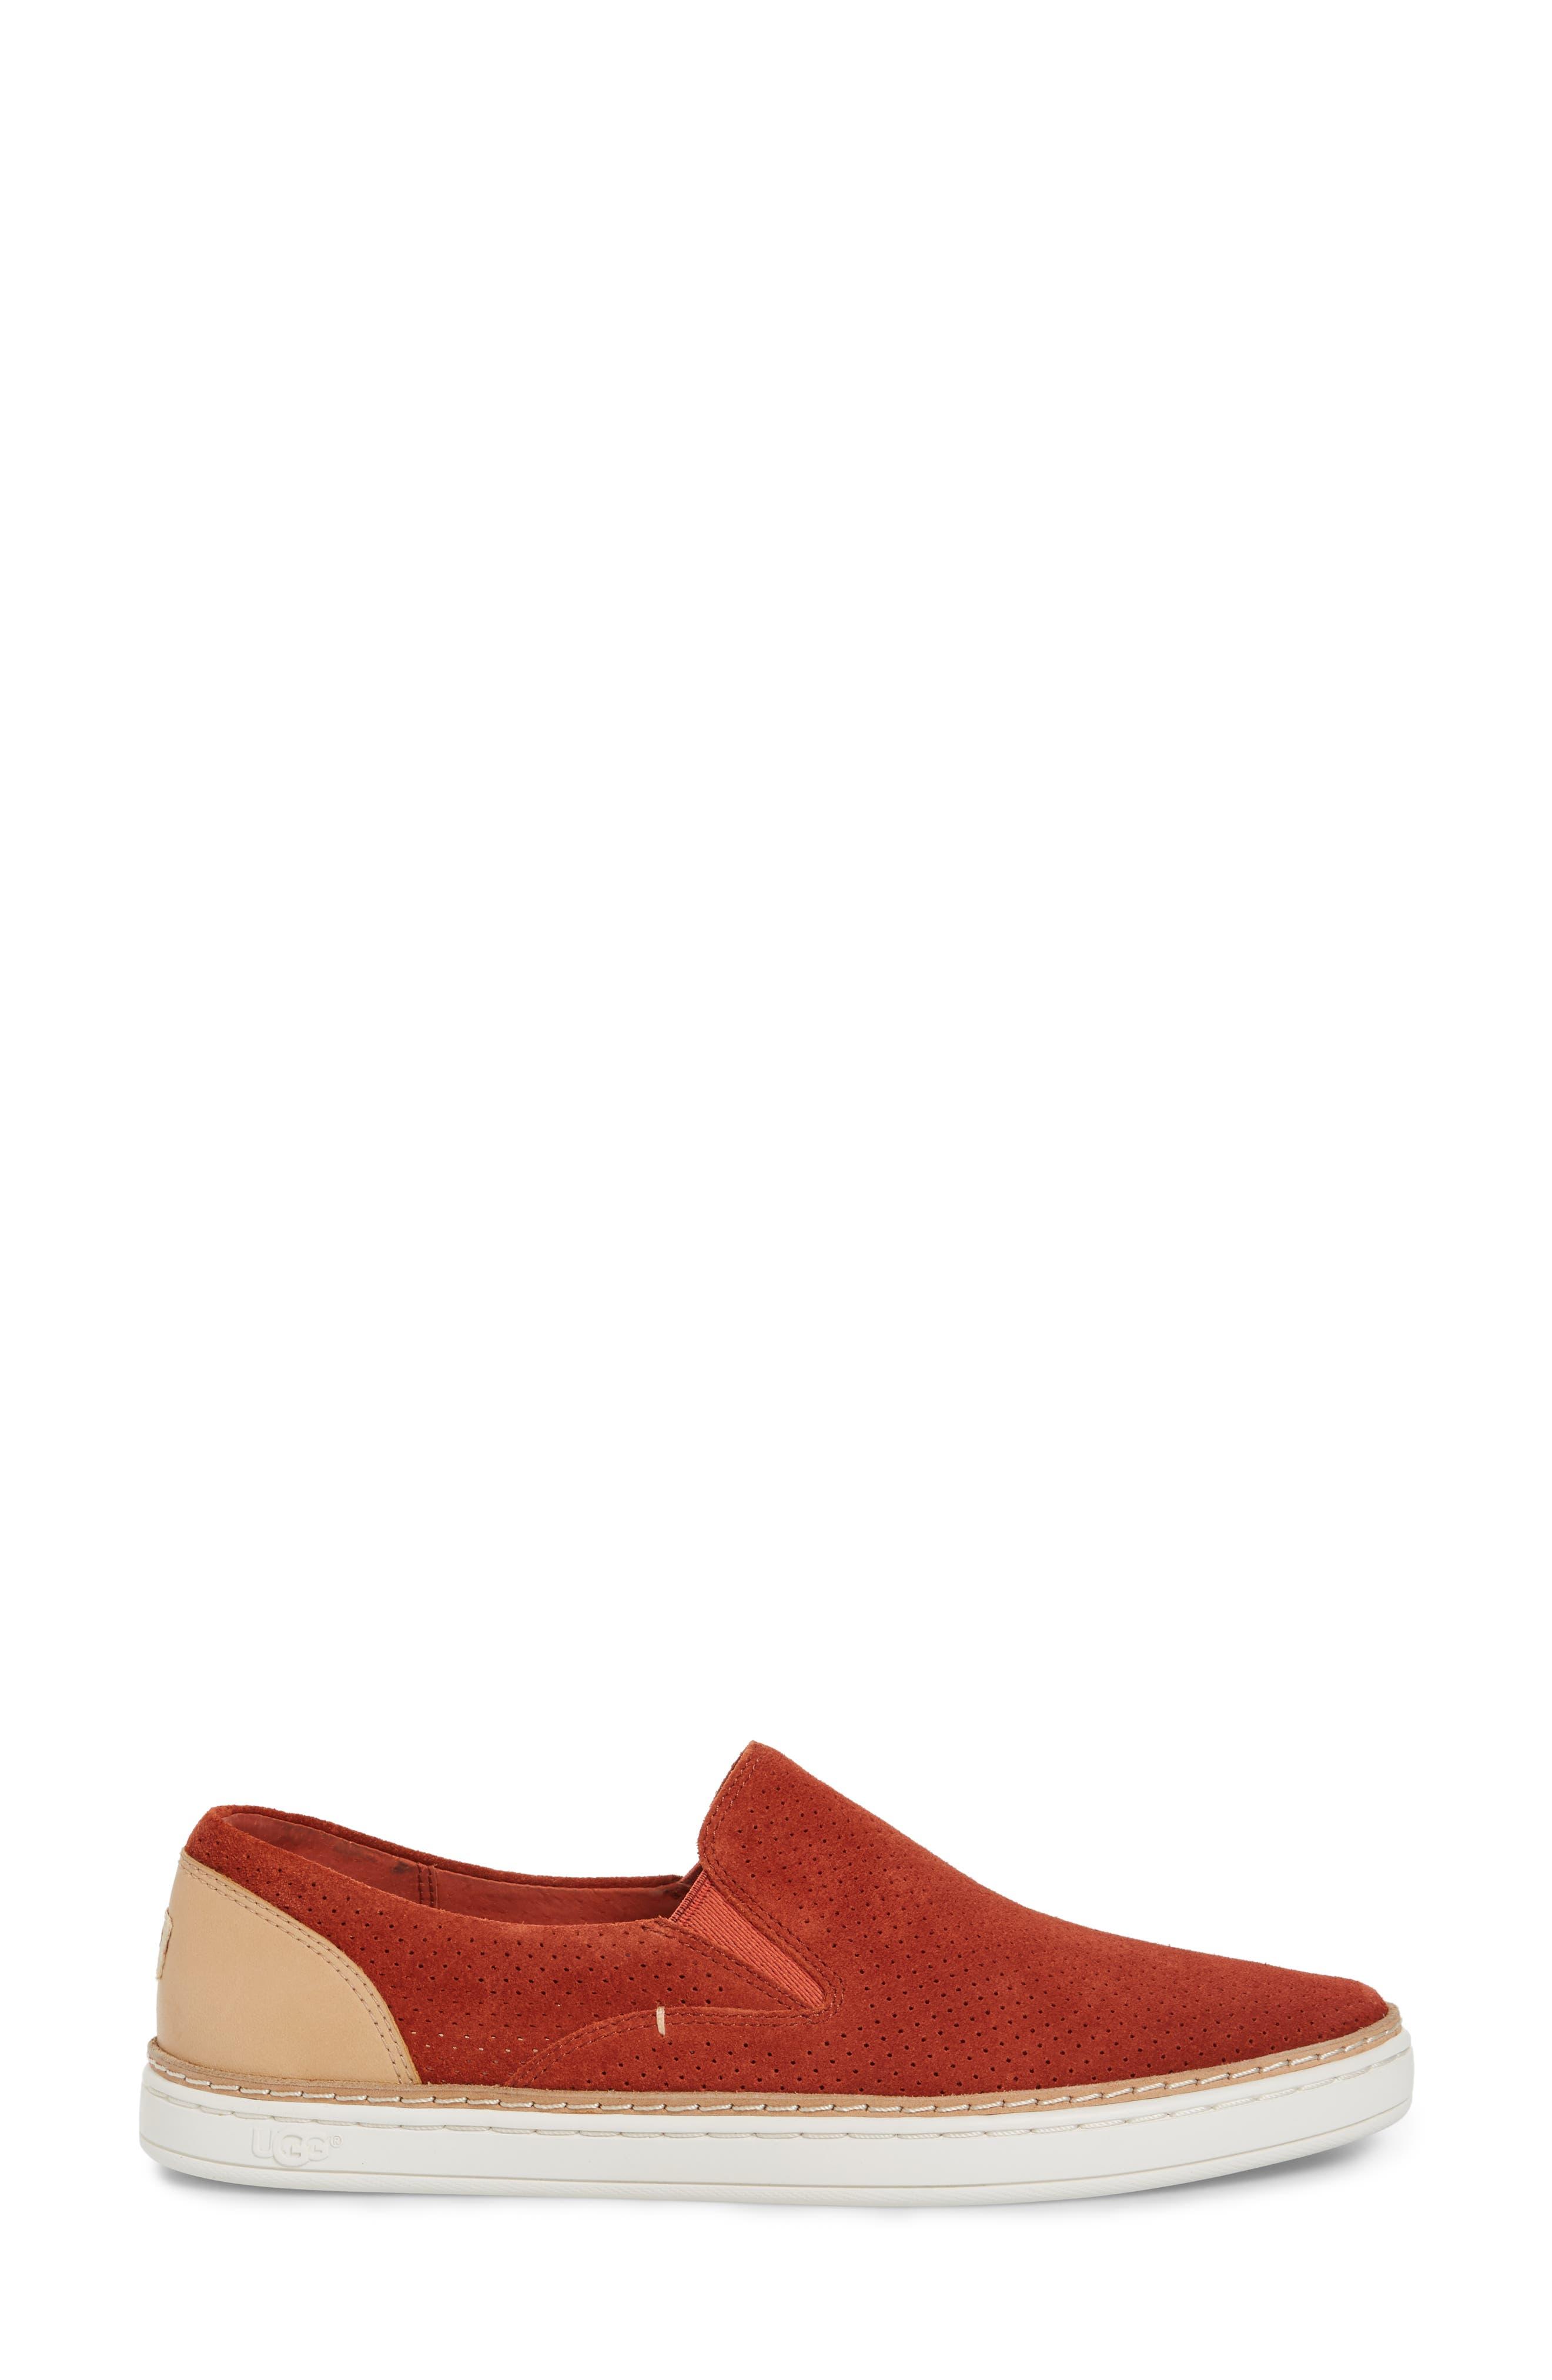 Adley Slip-On Sneaker,                             Alternate thumbnail 3, color,                             Paprika Suede